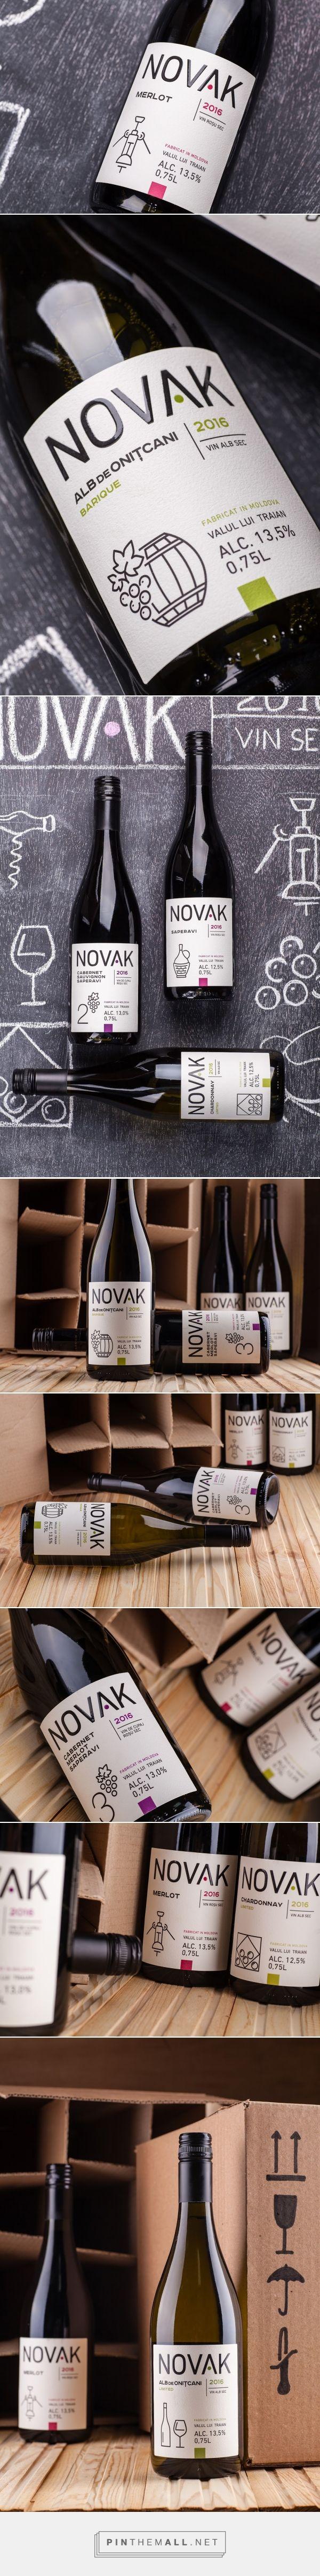 Novak Wine -  Packaging of the World - Creative Package Design Gallery - http://www.packagingoftheworld.com/2017/10/novak.html